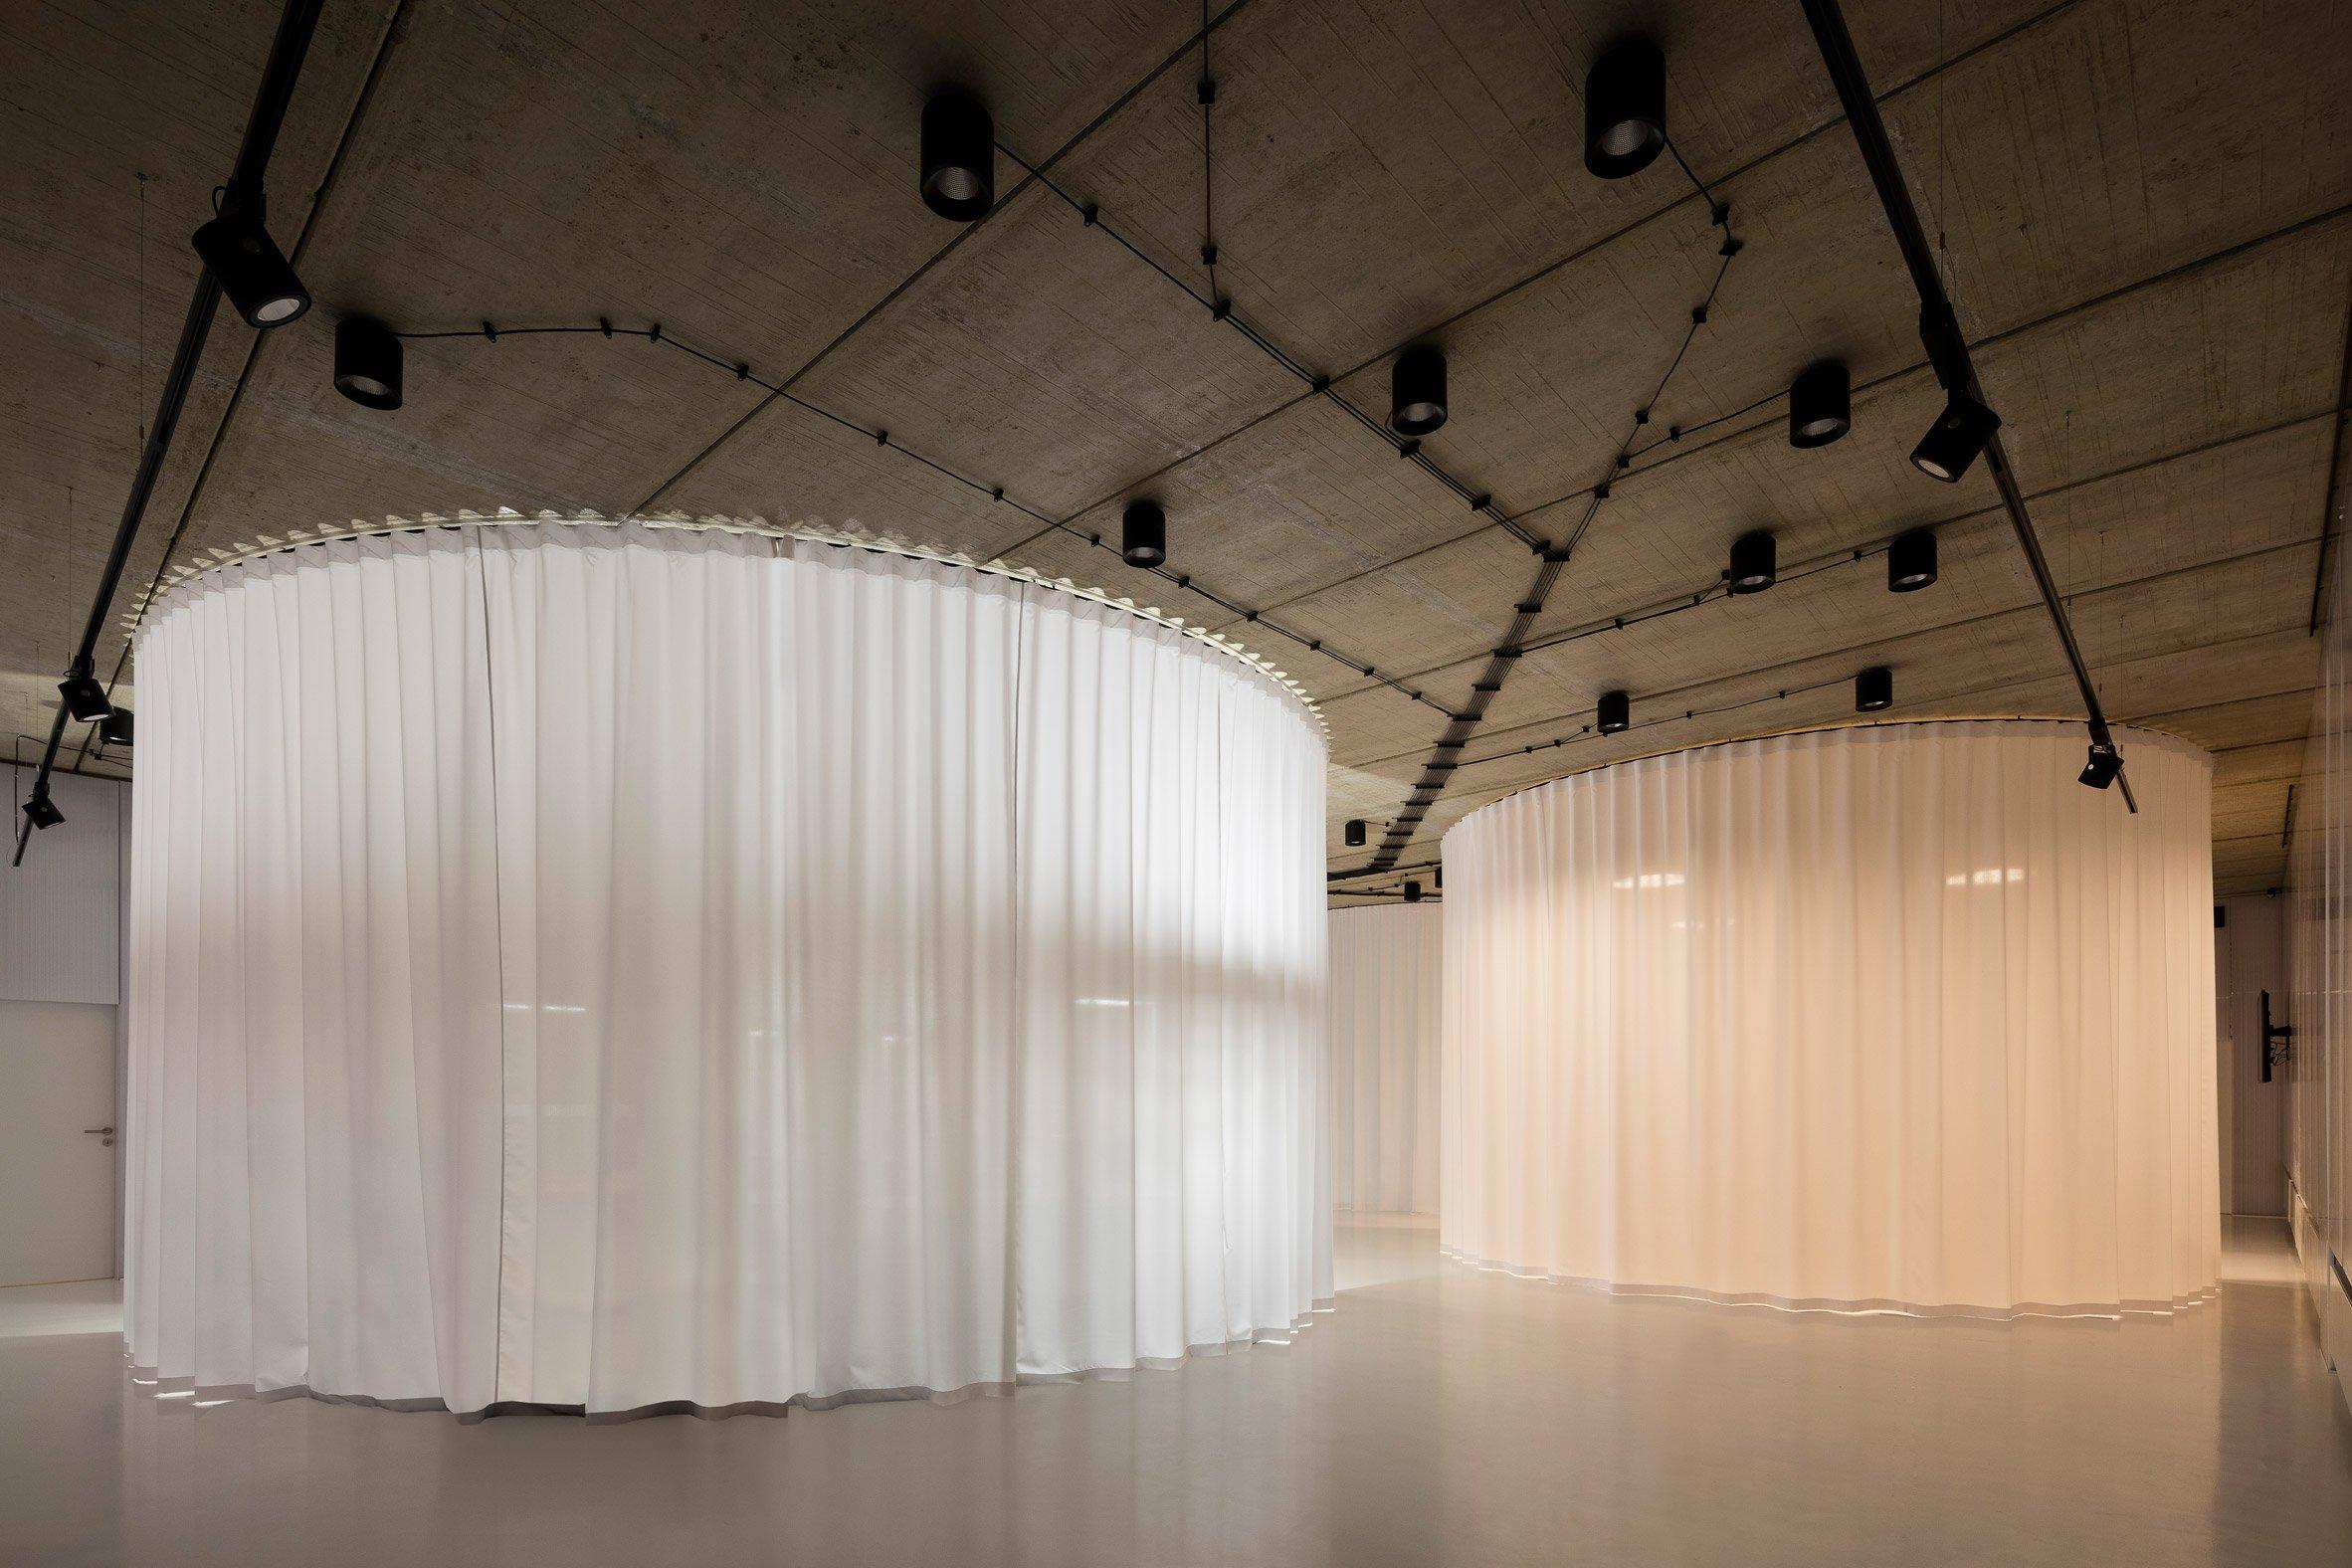 gallery-furniture-chybik-kistof-architecture-retail-czech-republic_dezeen_2364_col_8.jpg